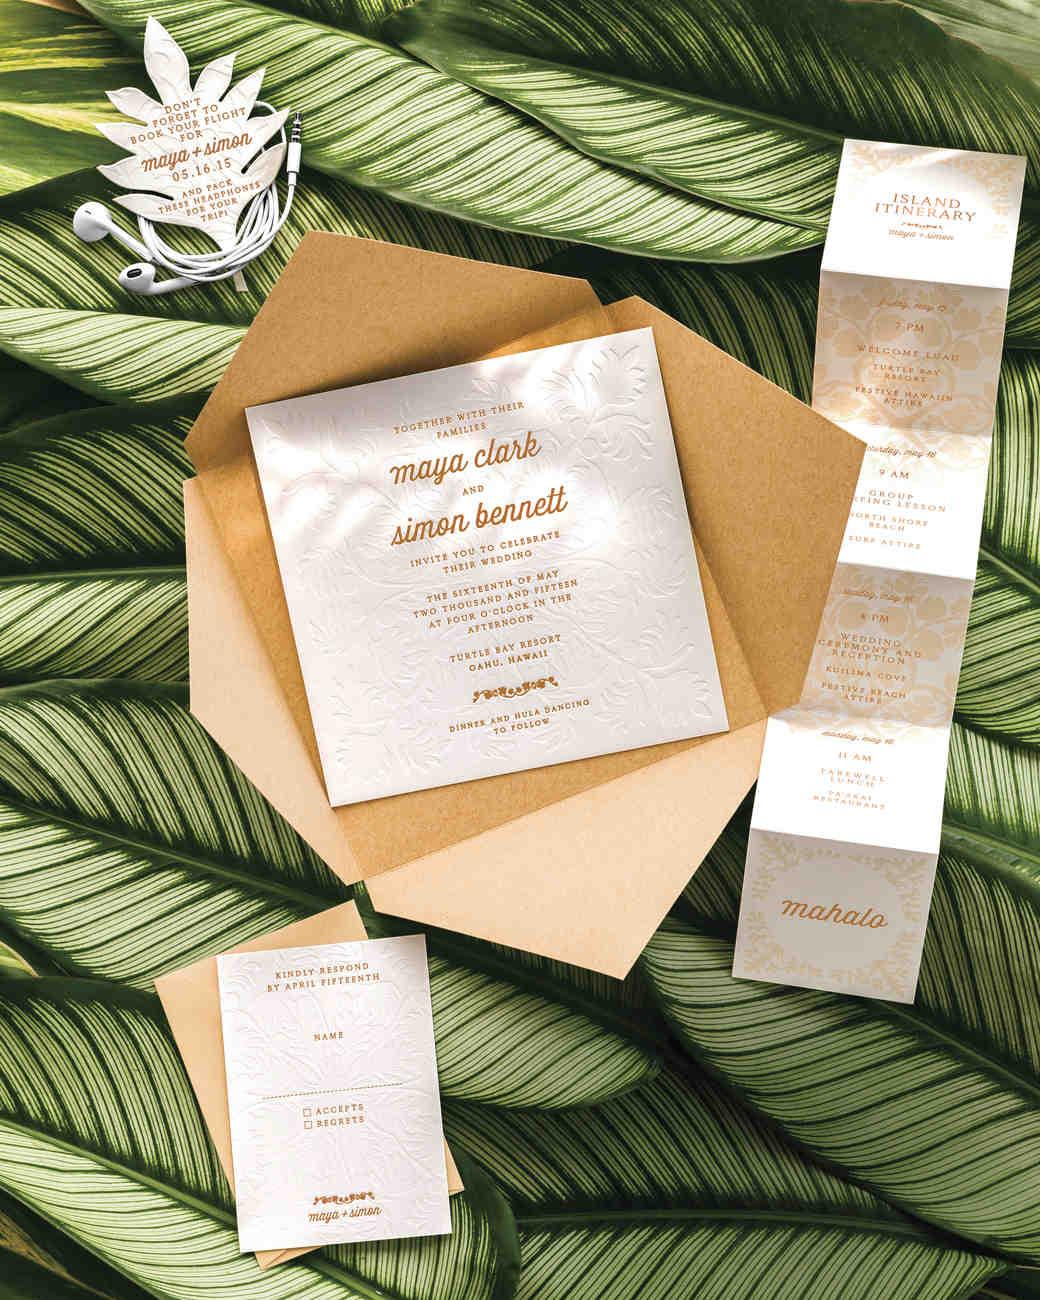 hawaii-invitation-105-d111376.jpg